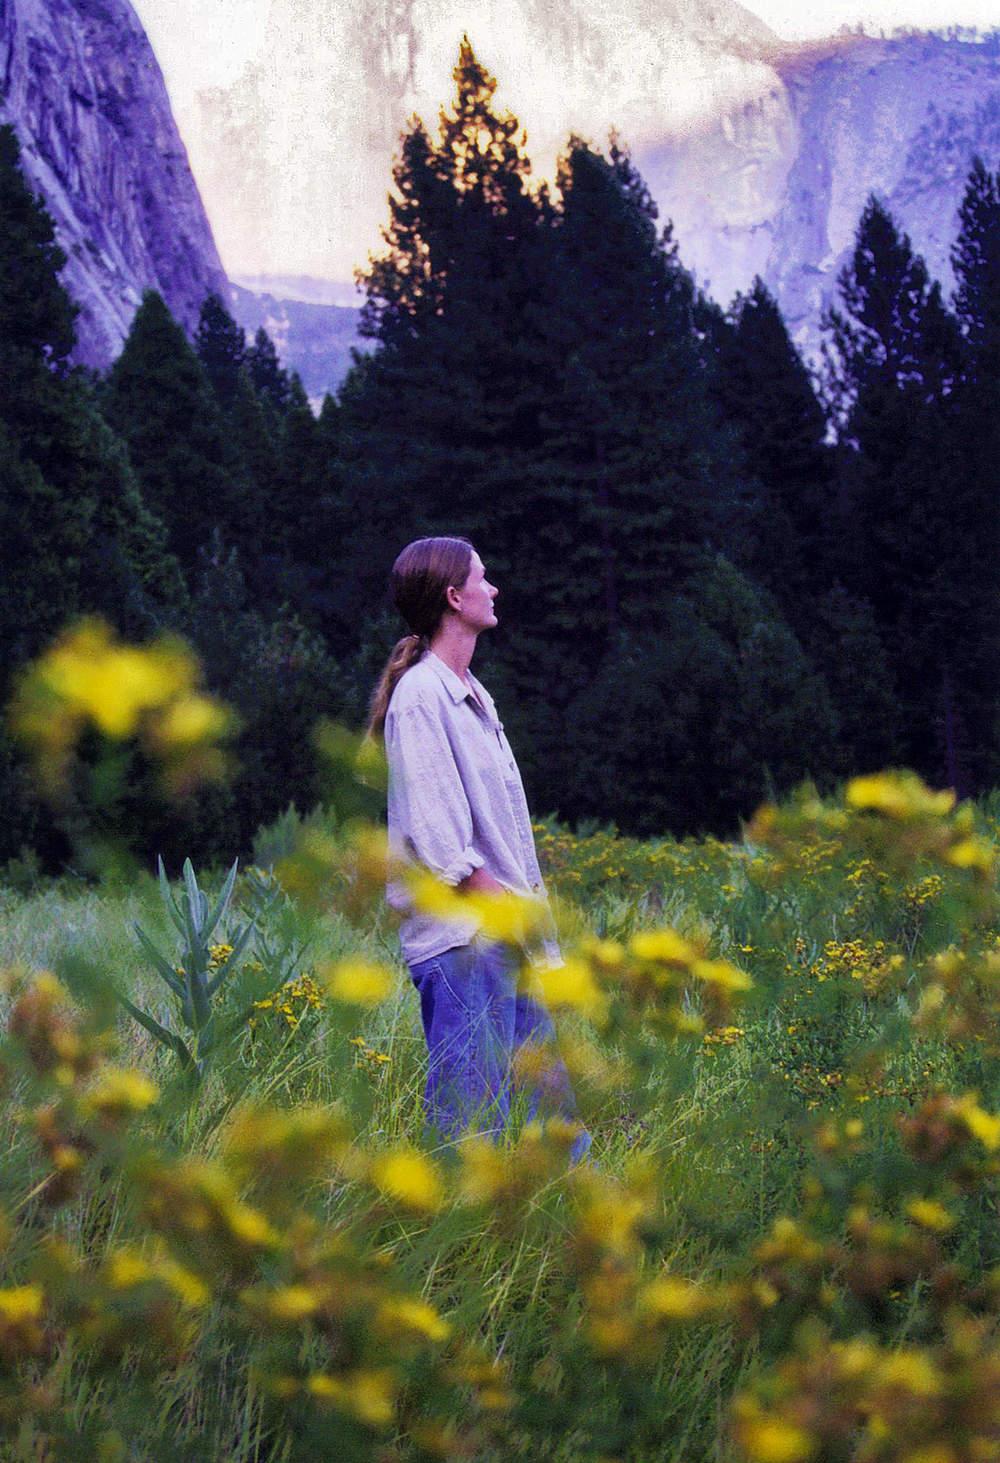 Susan Harlan Slater at Yosemite National Park